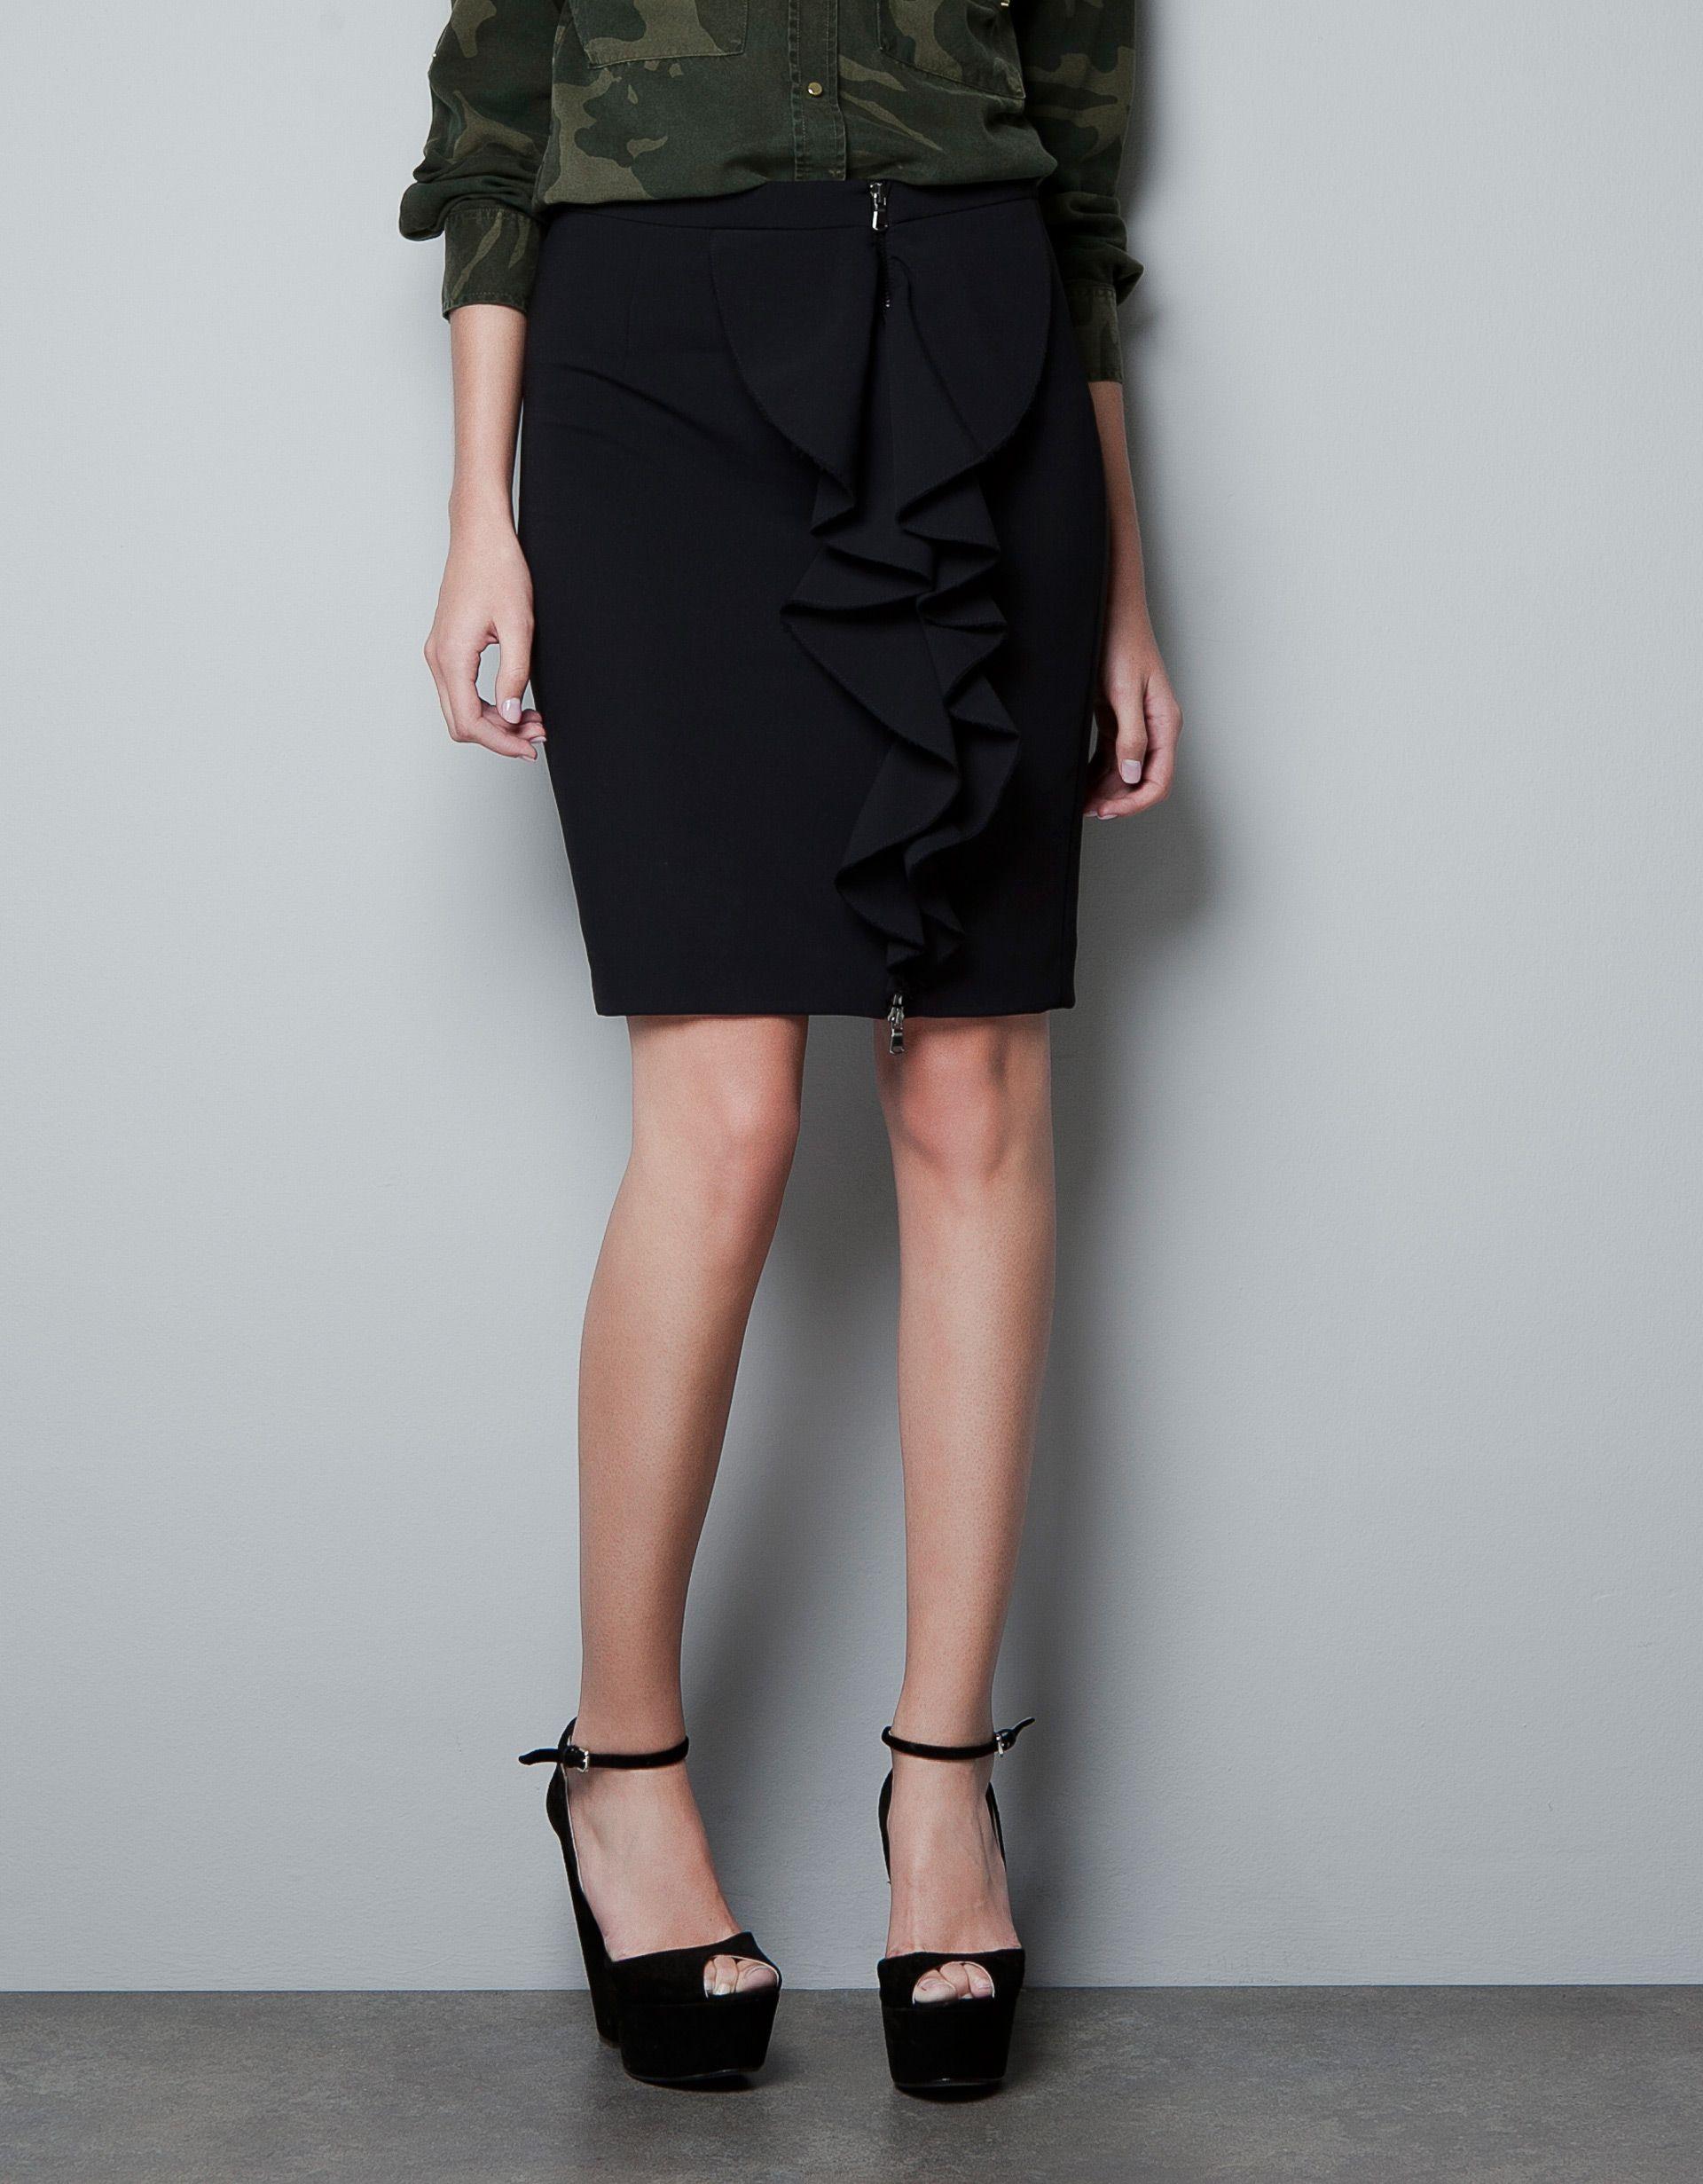 Tubo México Zara Falda Volante Faldas Mujer 4X6d86 4fc92fbc895